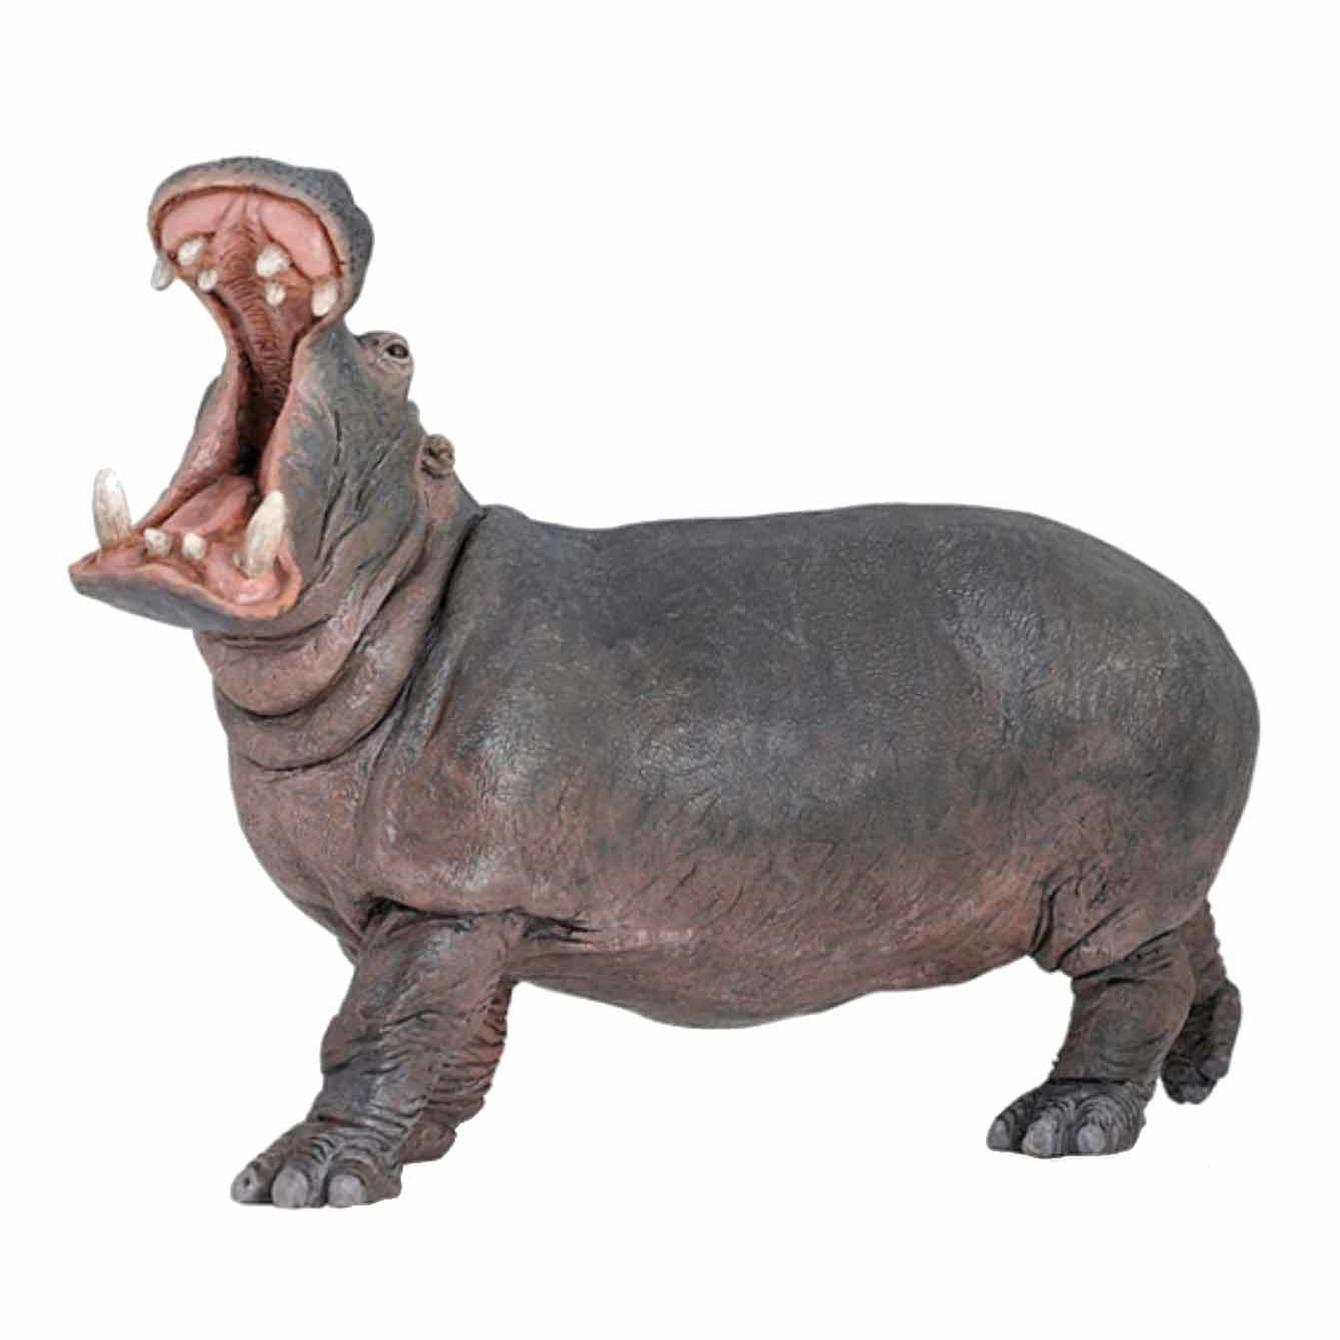 Plastic speelgoed figuur nijlpaard 15 cm